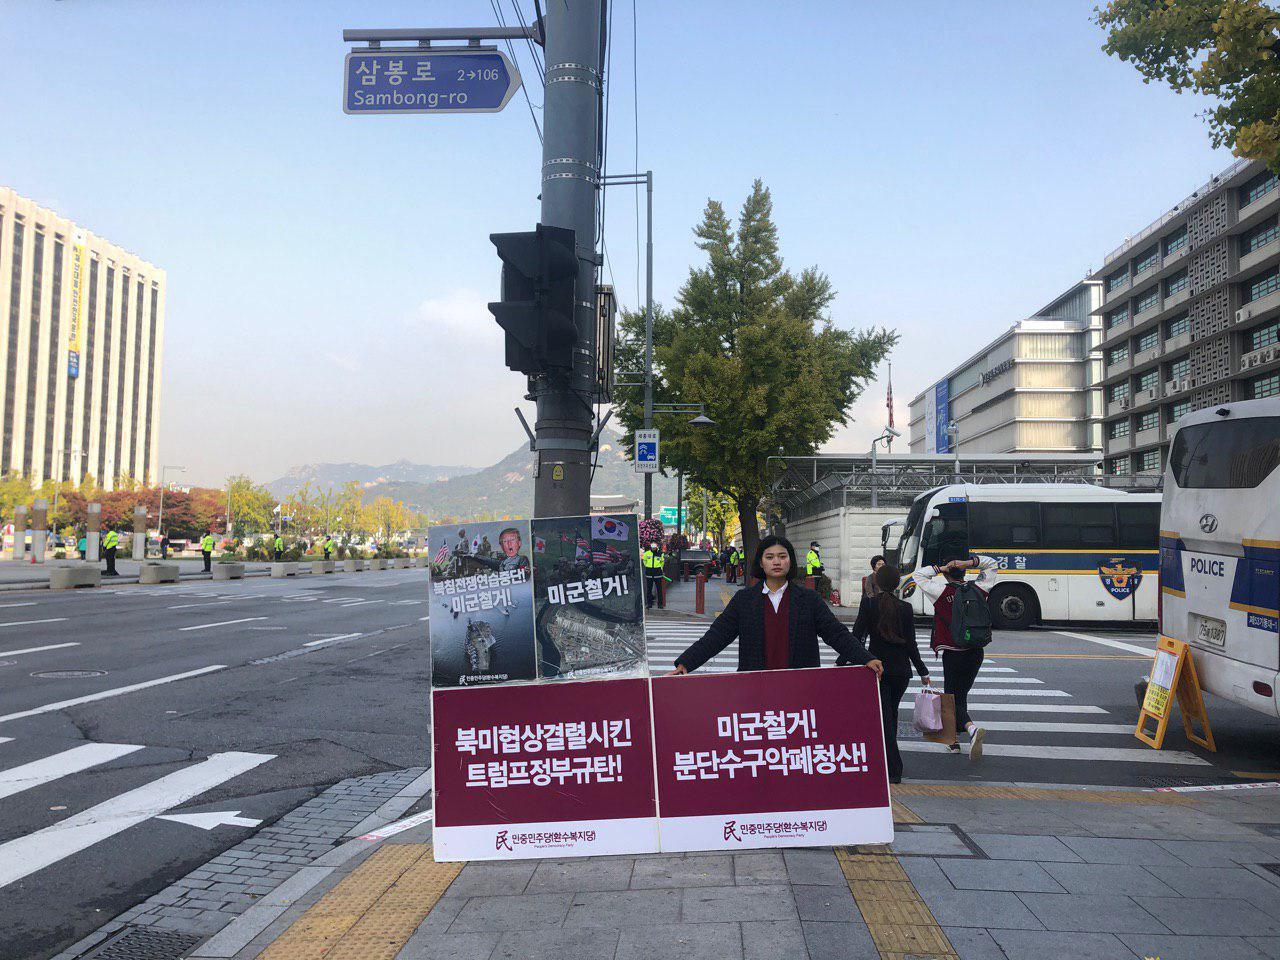 photo_2019-10-31_02-59-33.jpg